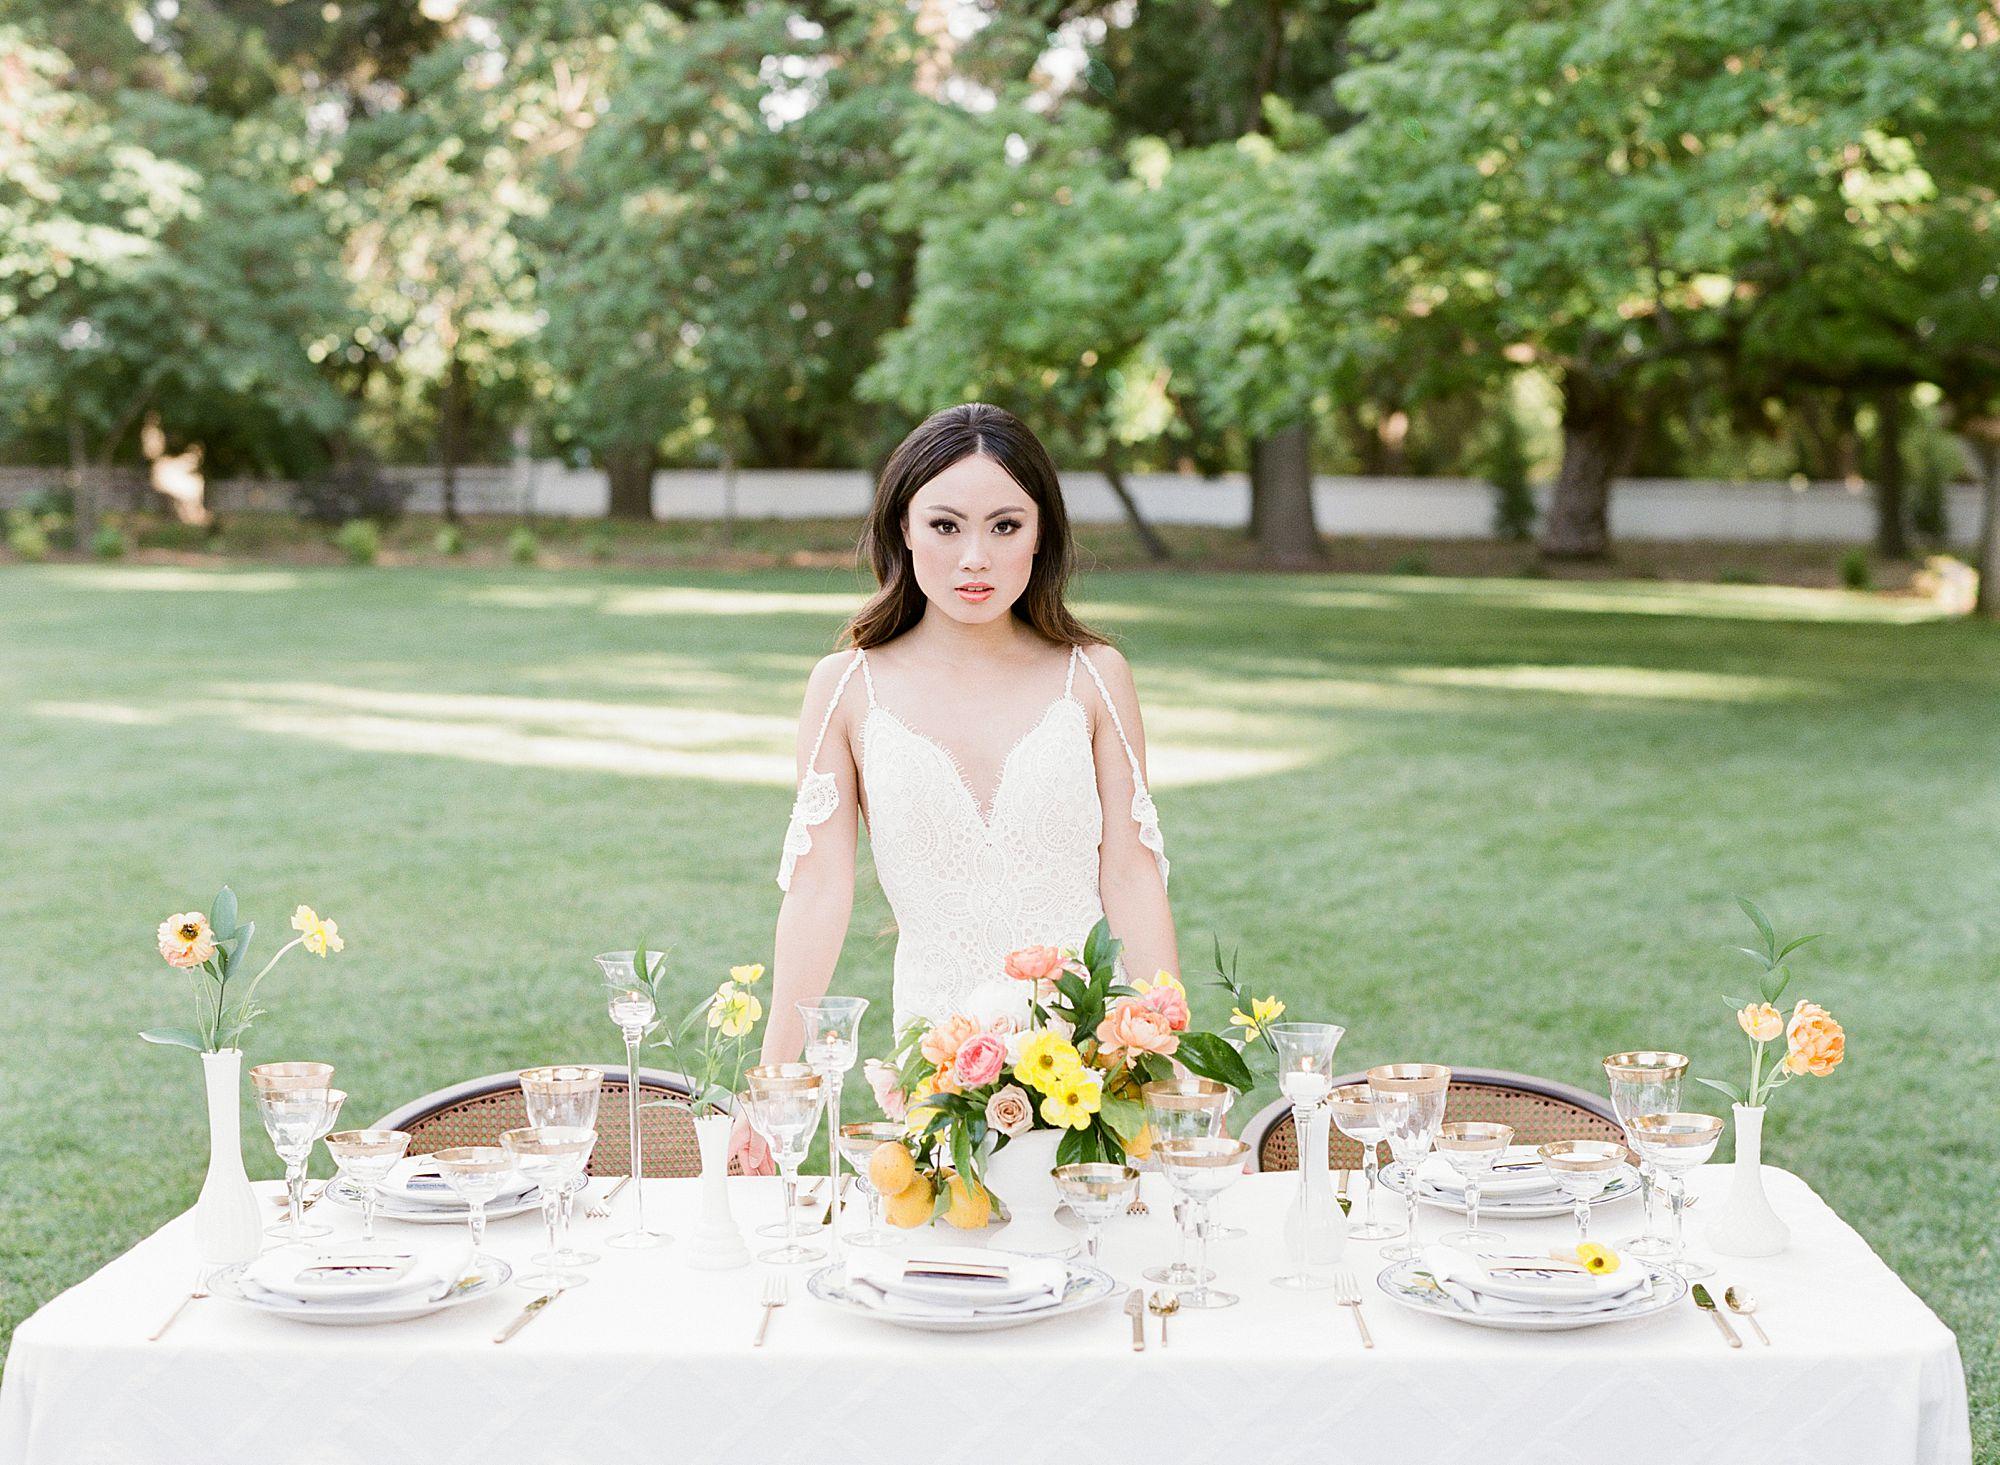 Italian Wedding Inspiration at The Maples Wedding & Event Center - Featured on Wedding Chicks - Ashley Baumgartner - Sacramento Wedding Phtoographer_0047.jpg